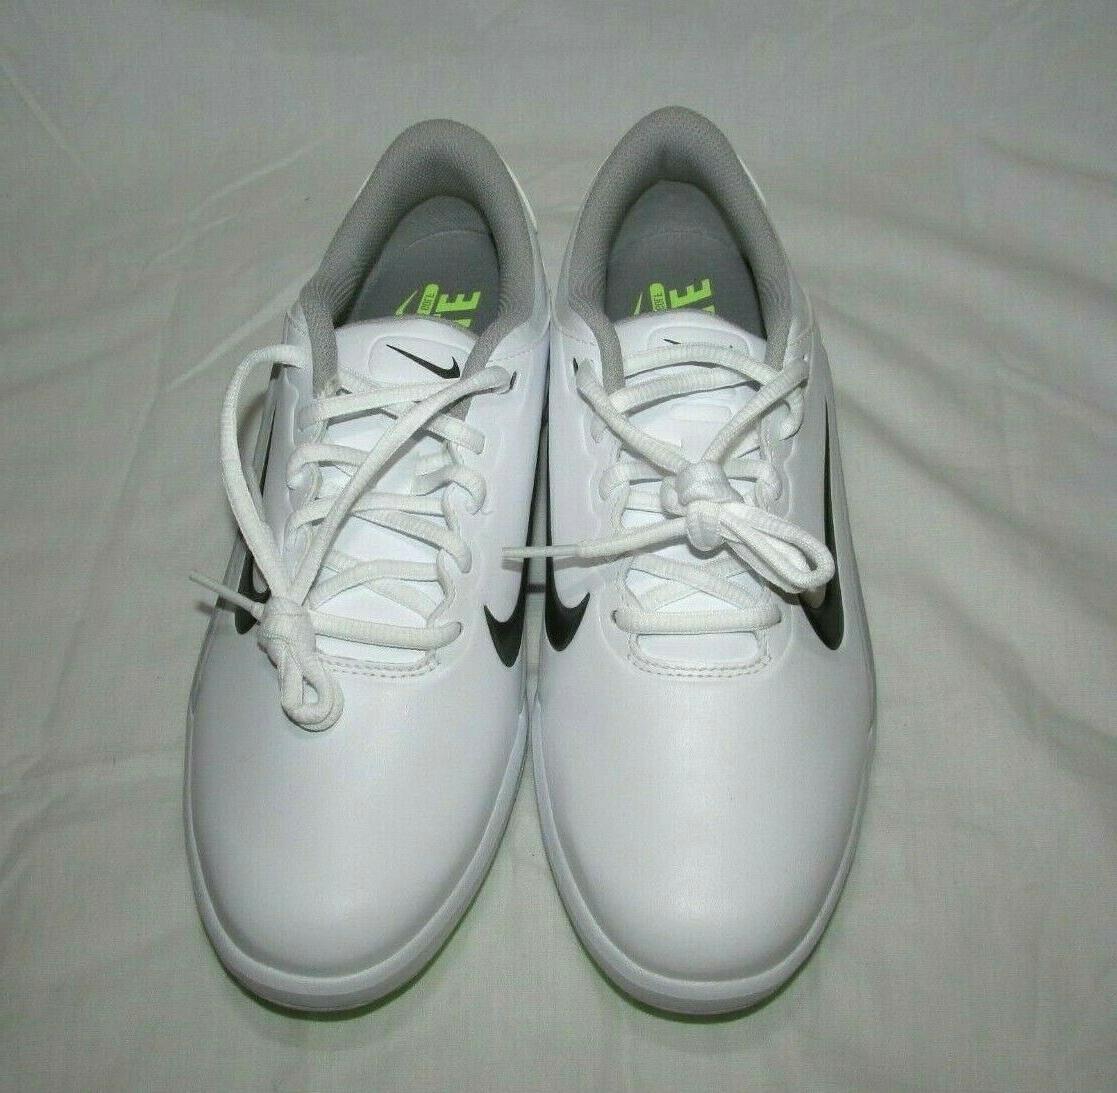 Nike Vapor Shoes 8 Grey